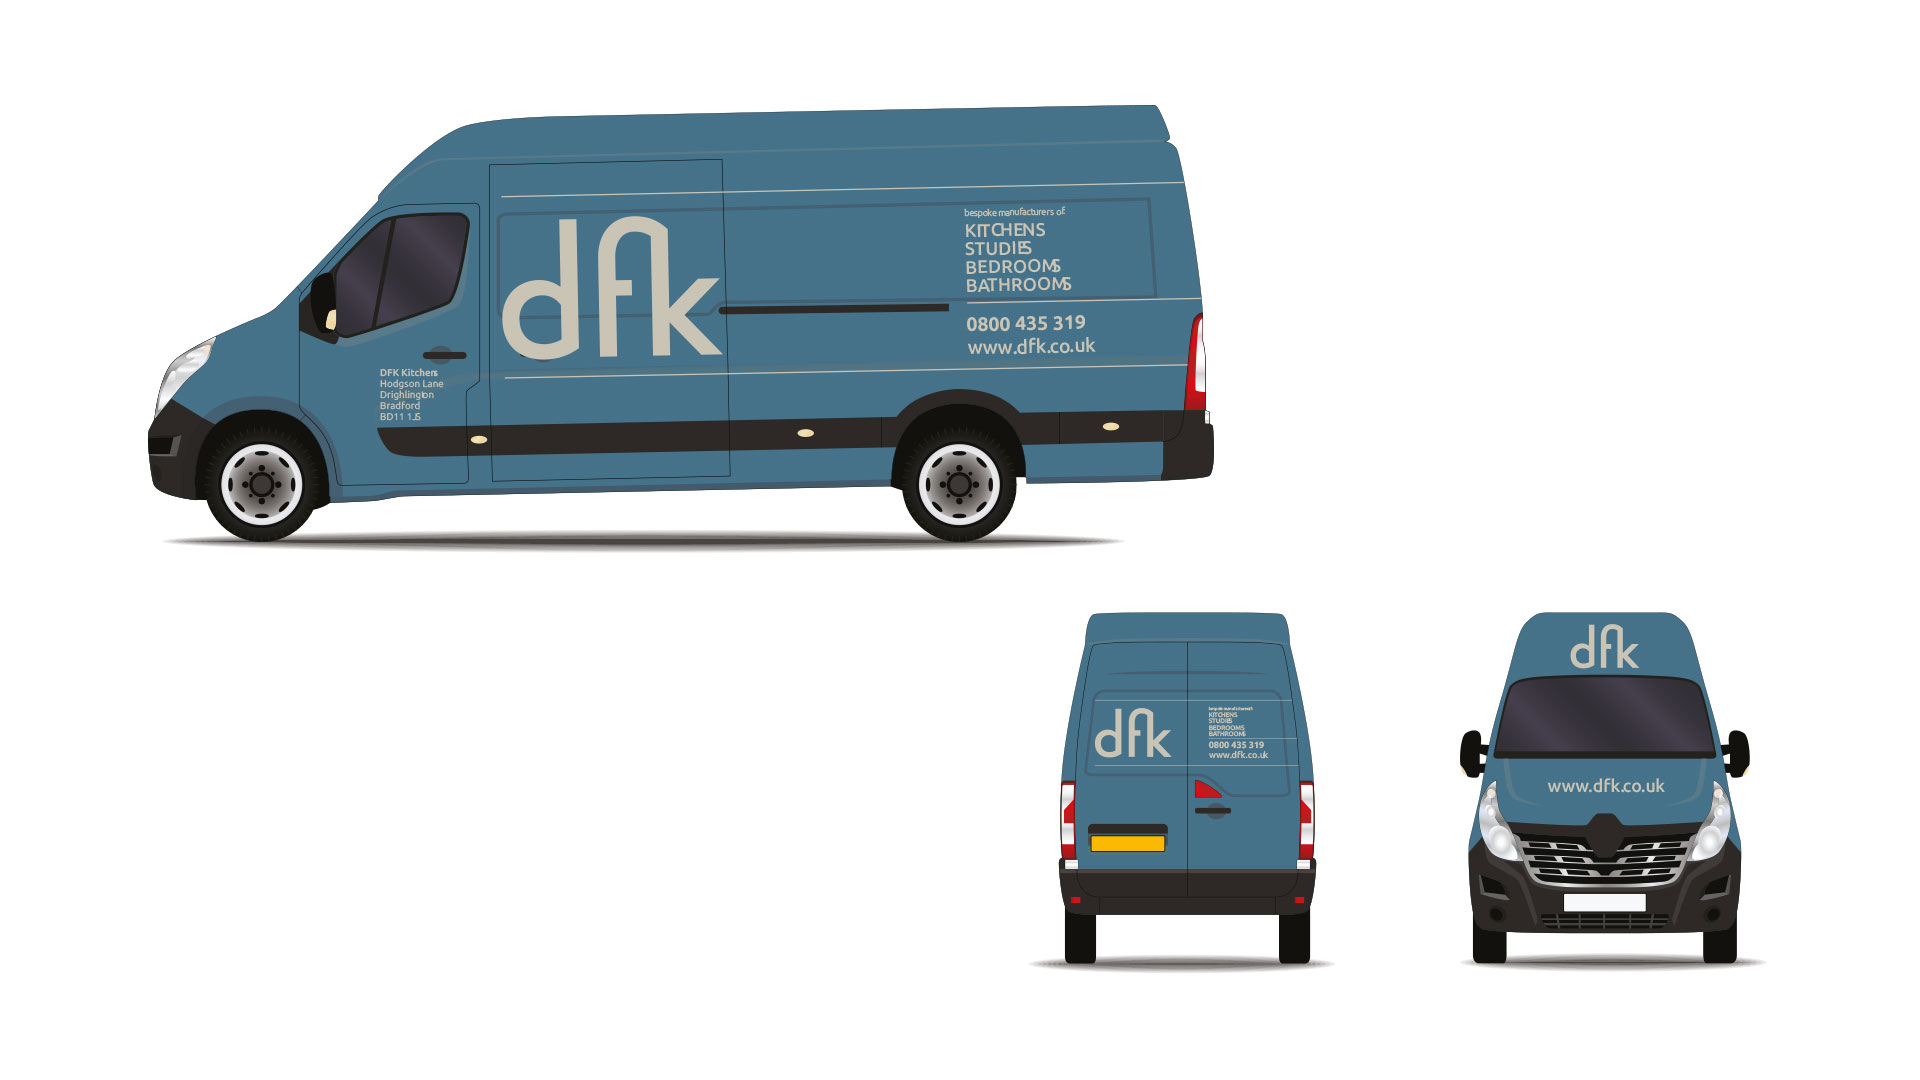 DFK branded vehicles